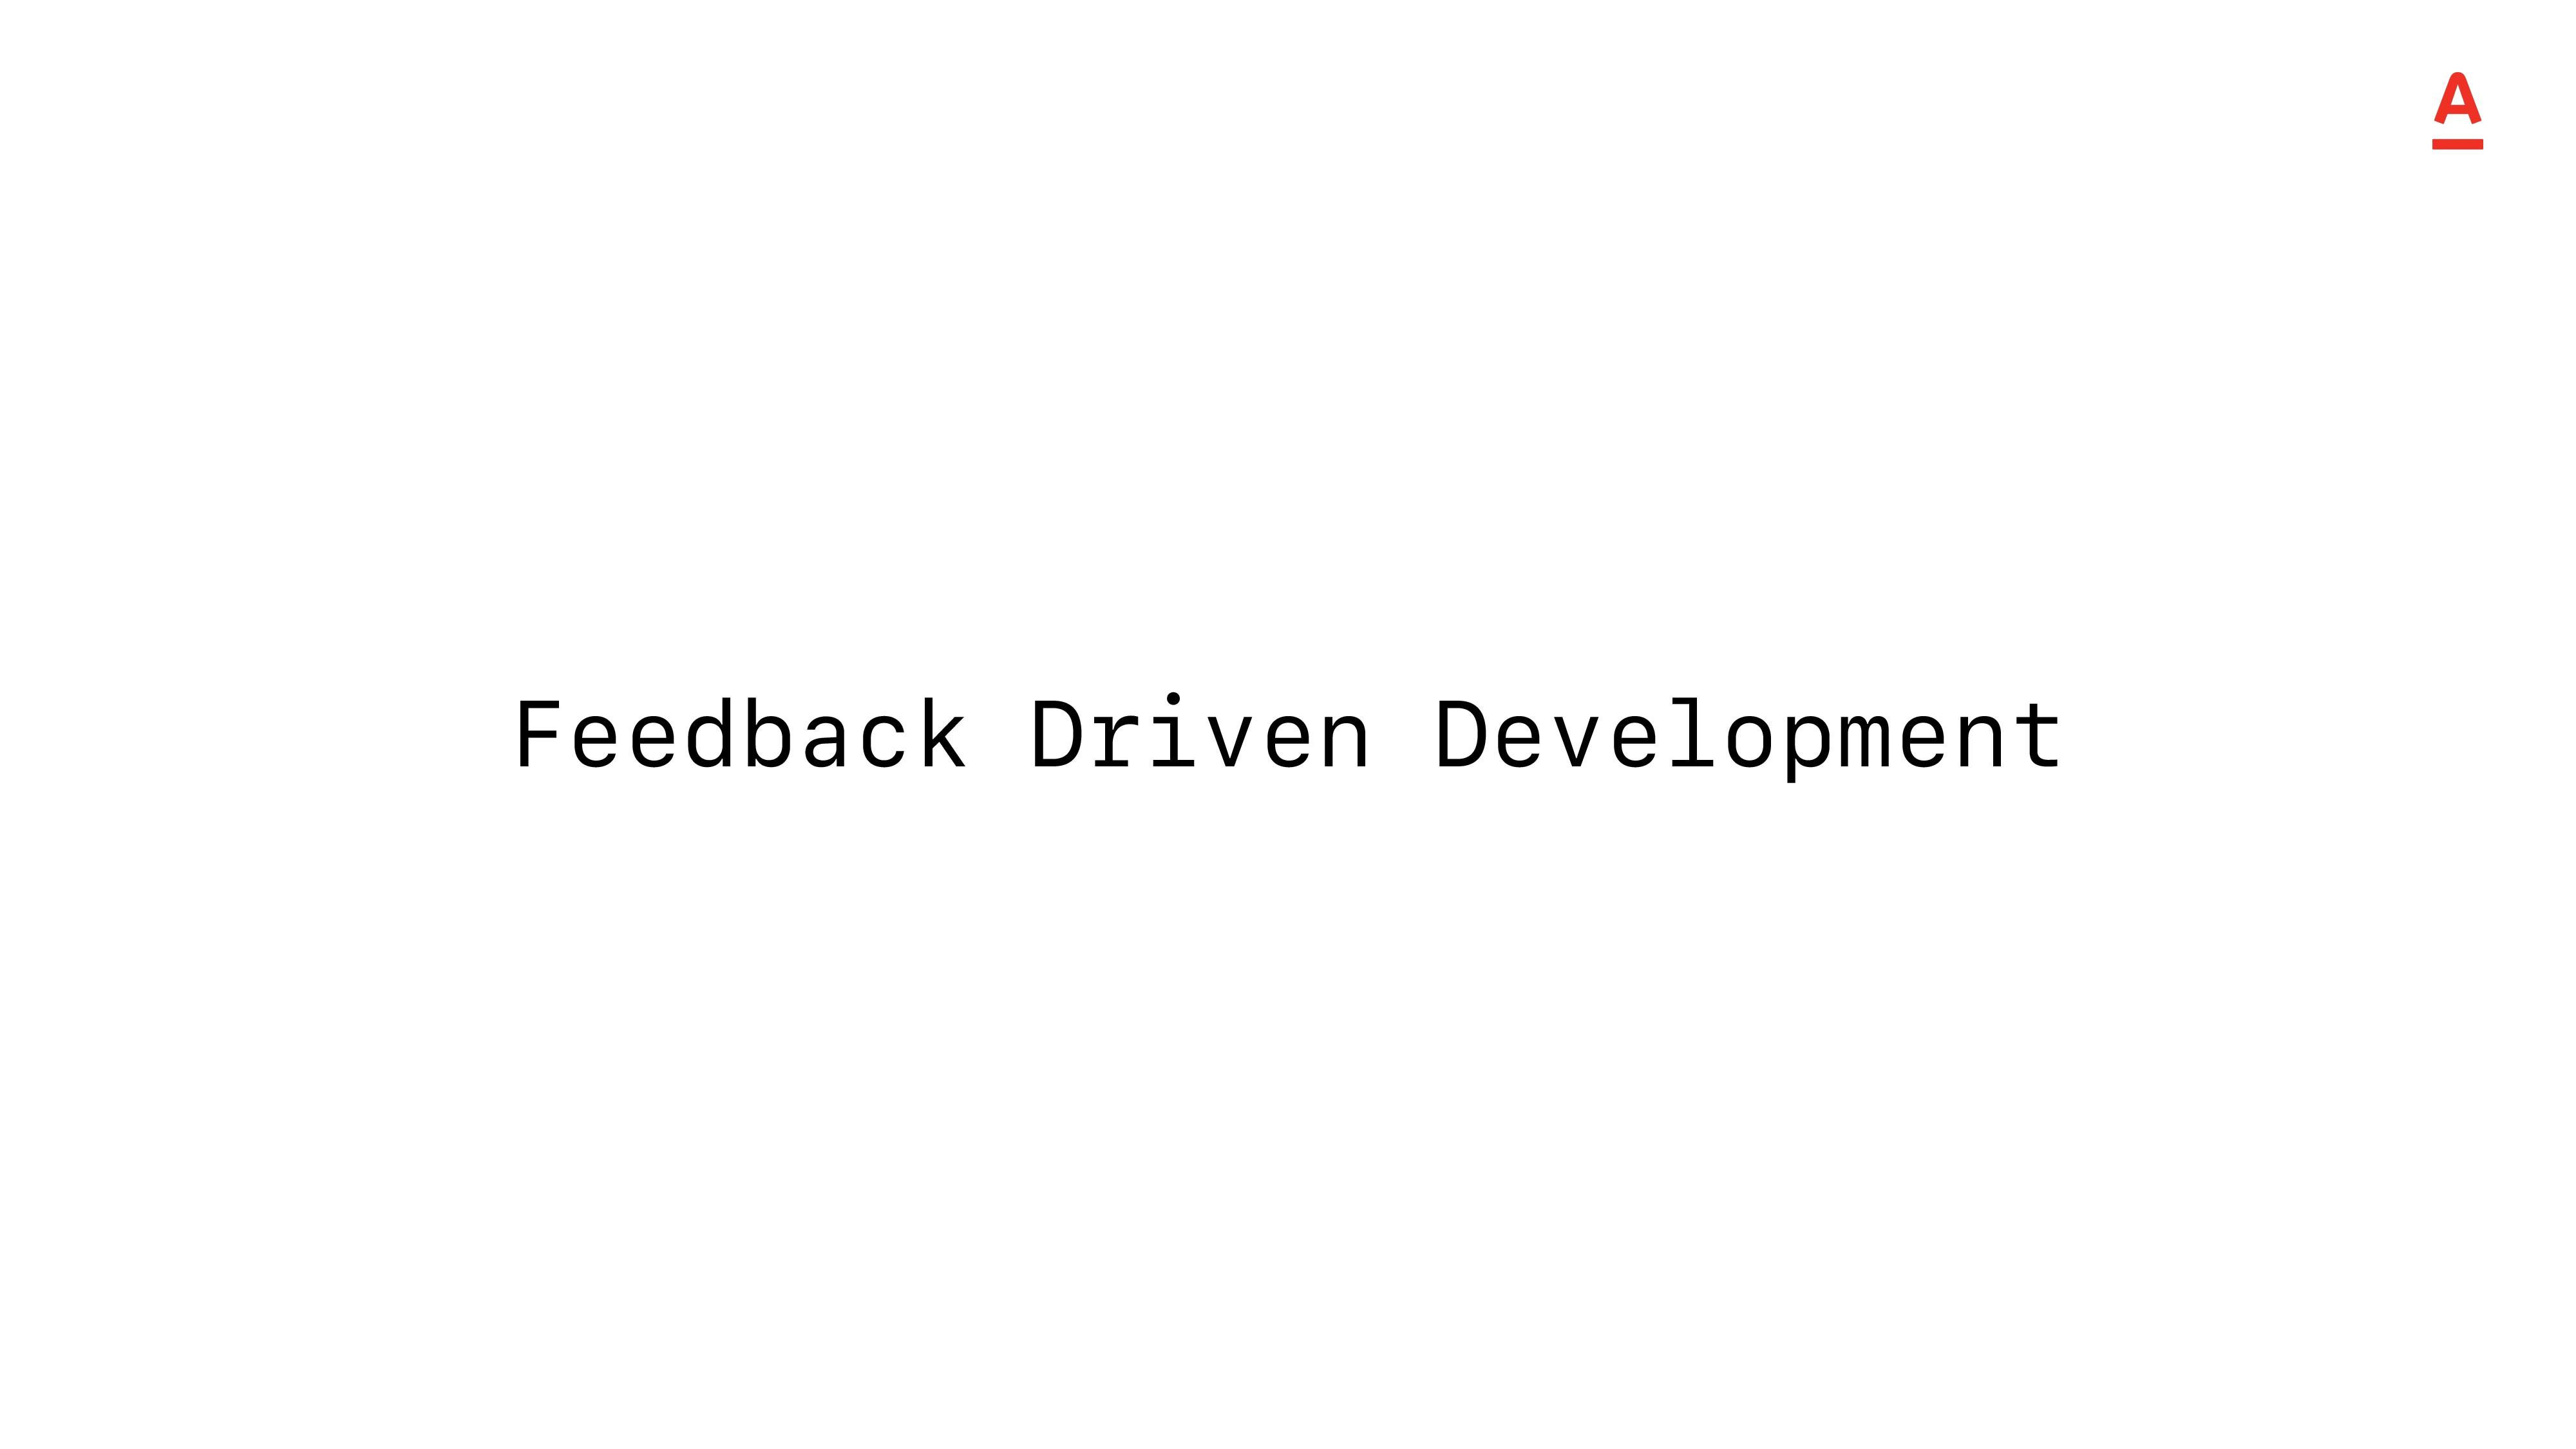 Feedback Driven Development